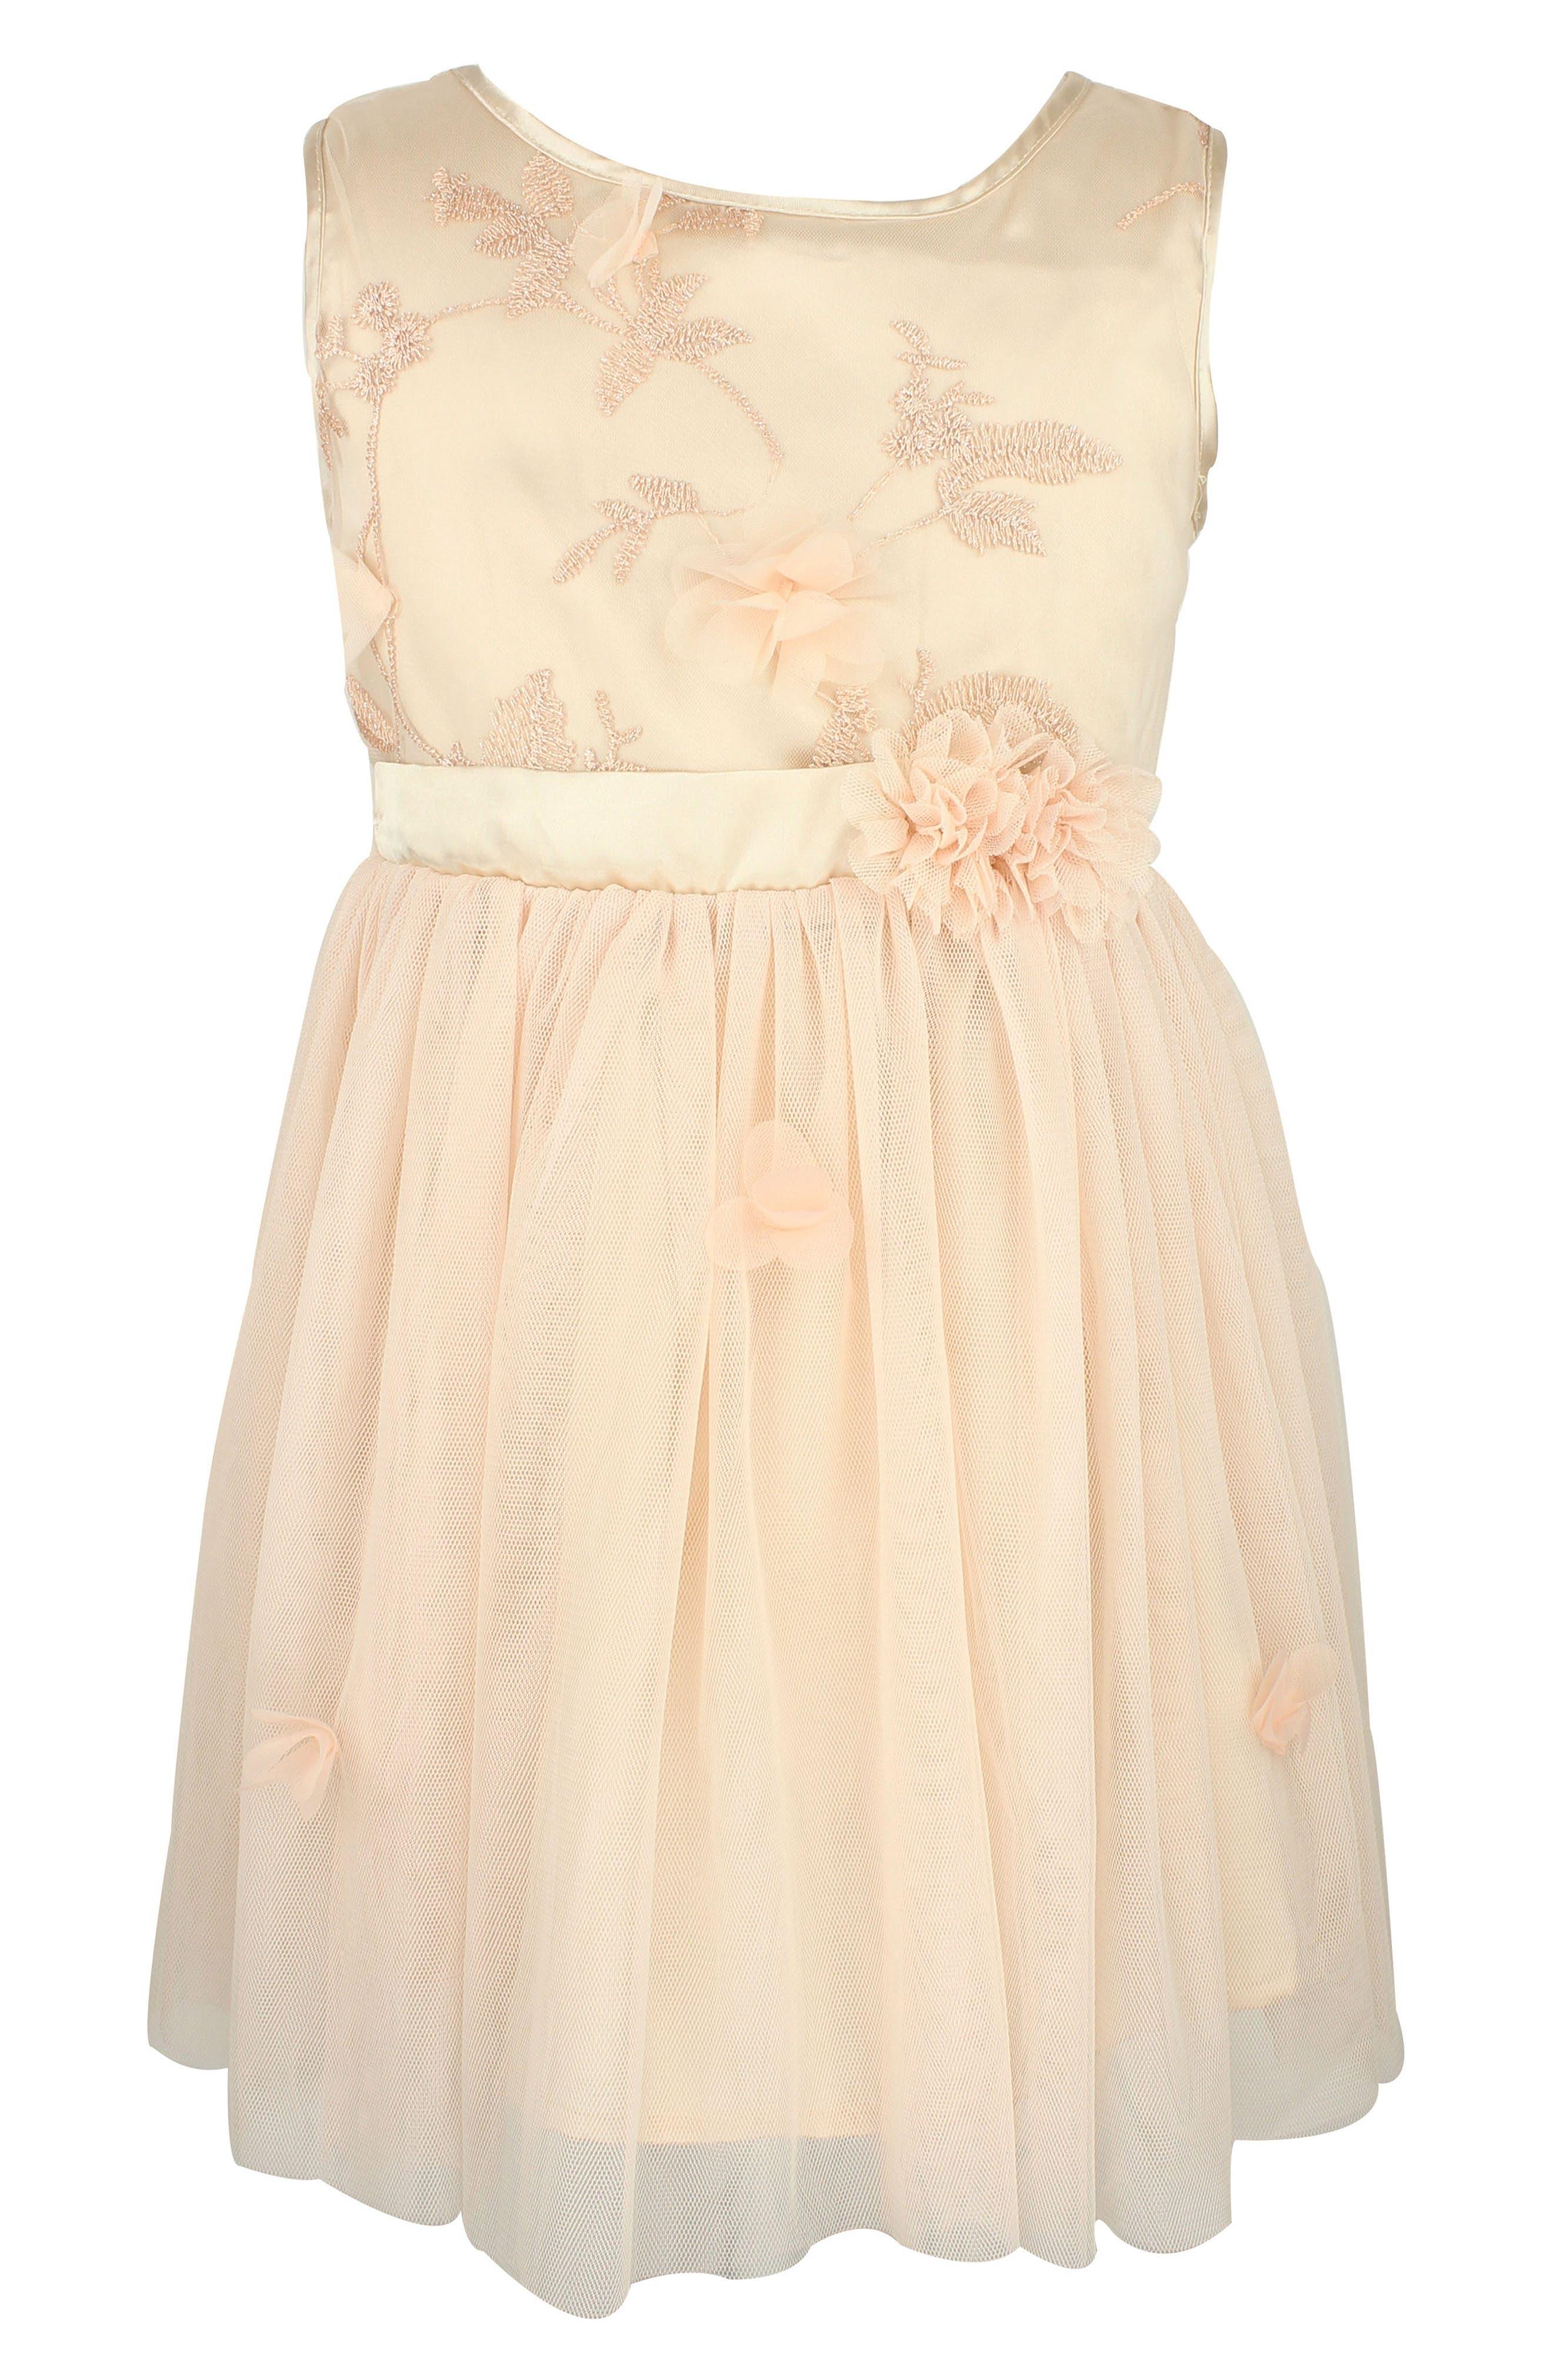 Flower Tulle Dress,                             Main thumbnail 1, color,                             Ivory